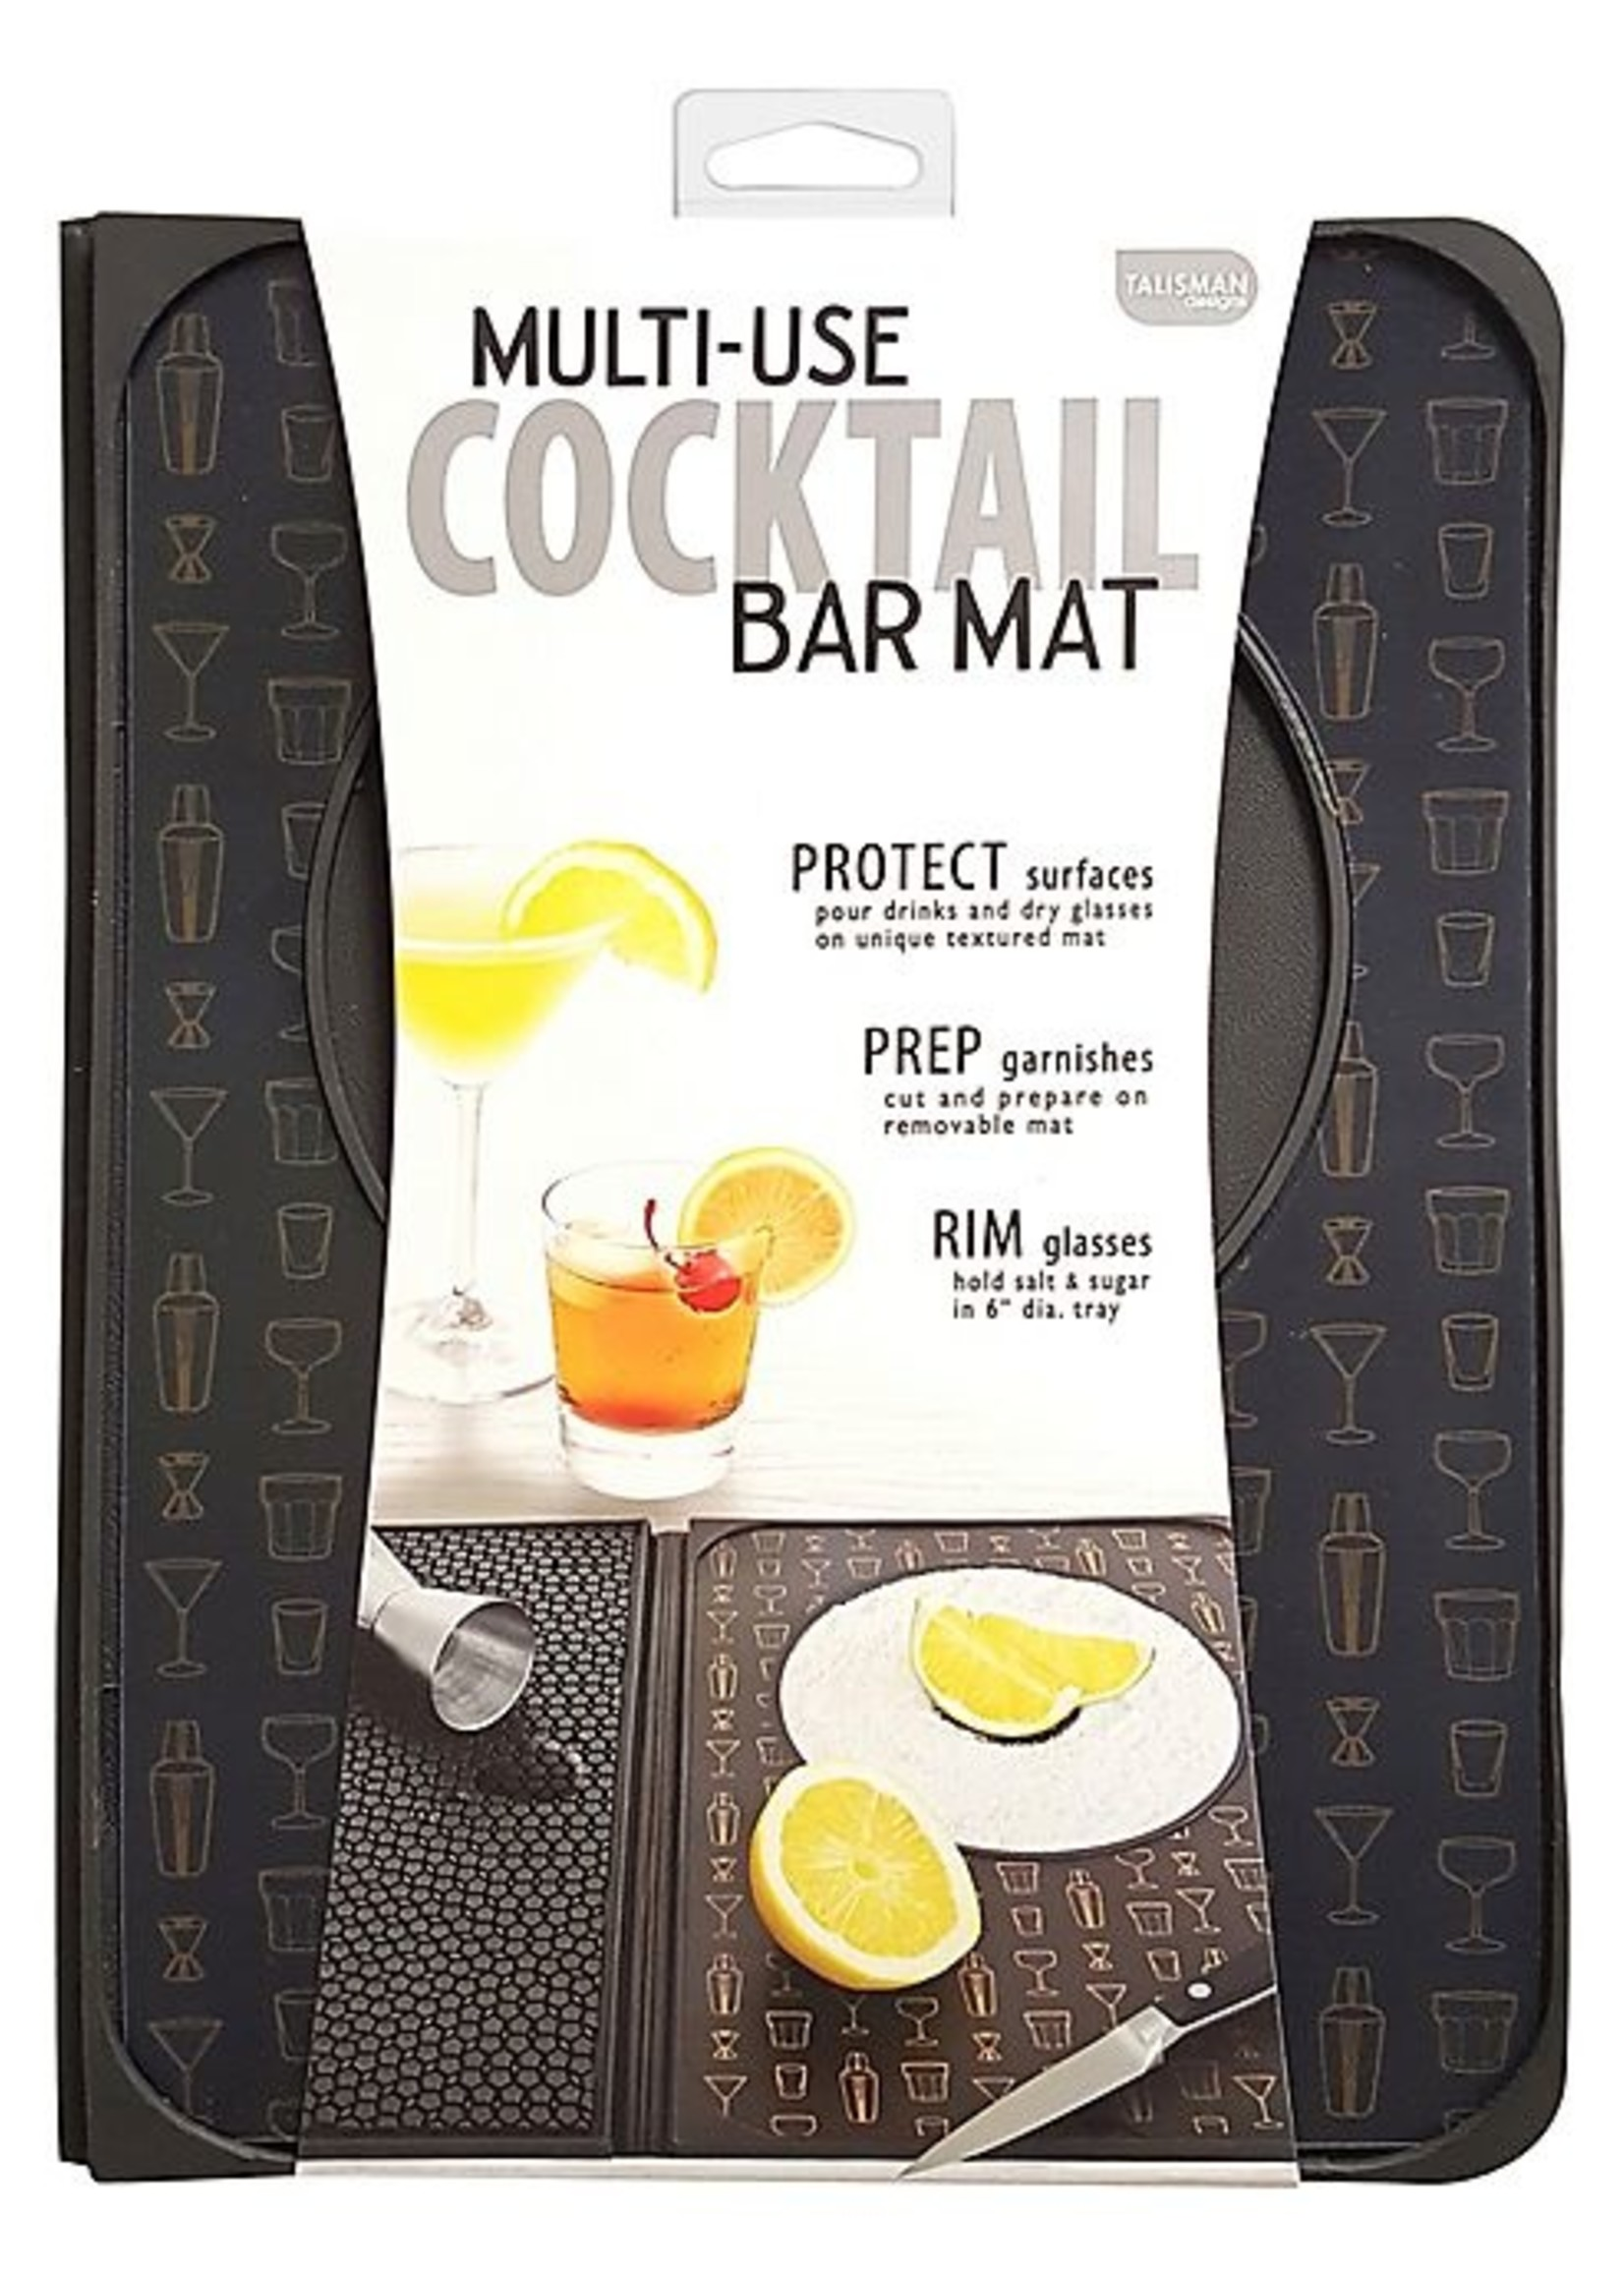 Talisman Designs Multi-Use Cocktail Bar Mat